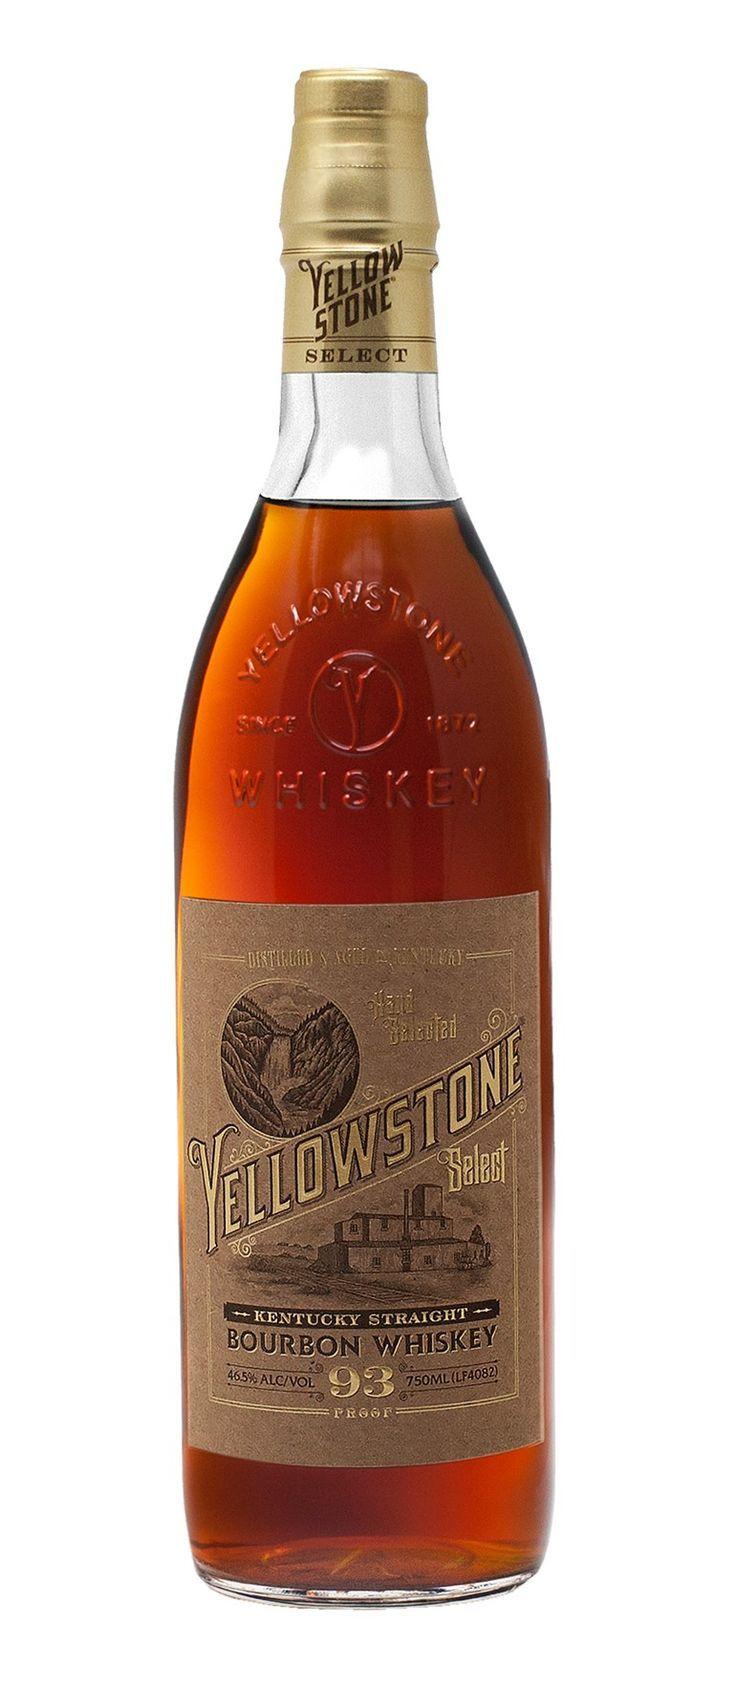 Yellowstone Select Kentucky Straight Bourbon Whiskey Bourbon Whiskey Kentucky Straight Bourbon Whiskey Kentucky Straight Bourbon